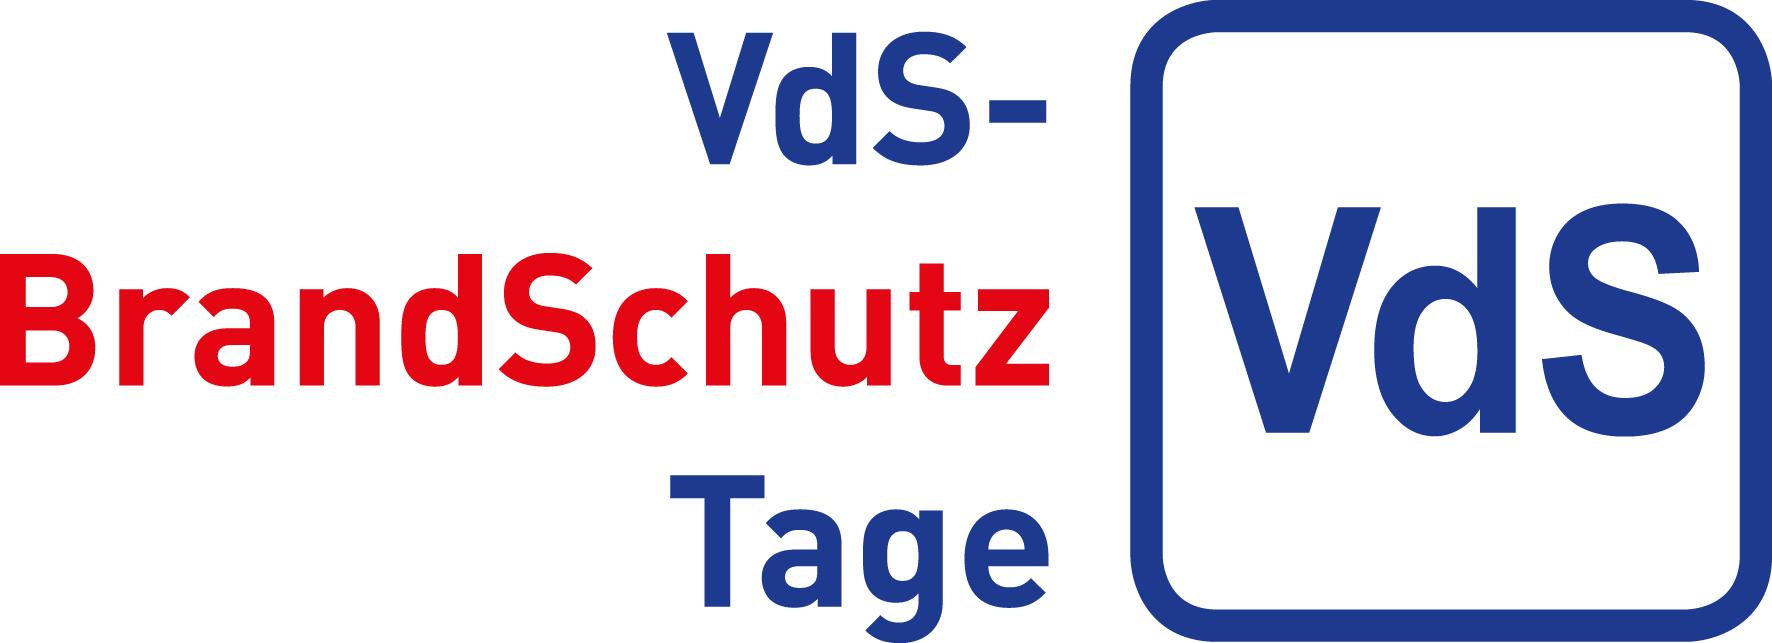 vds Brandschutztage 2019